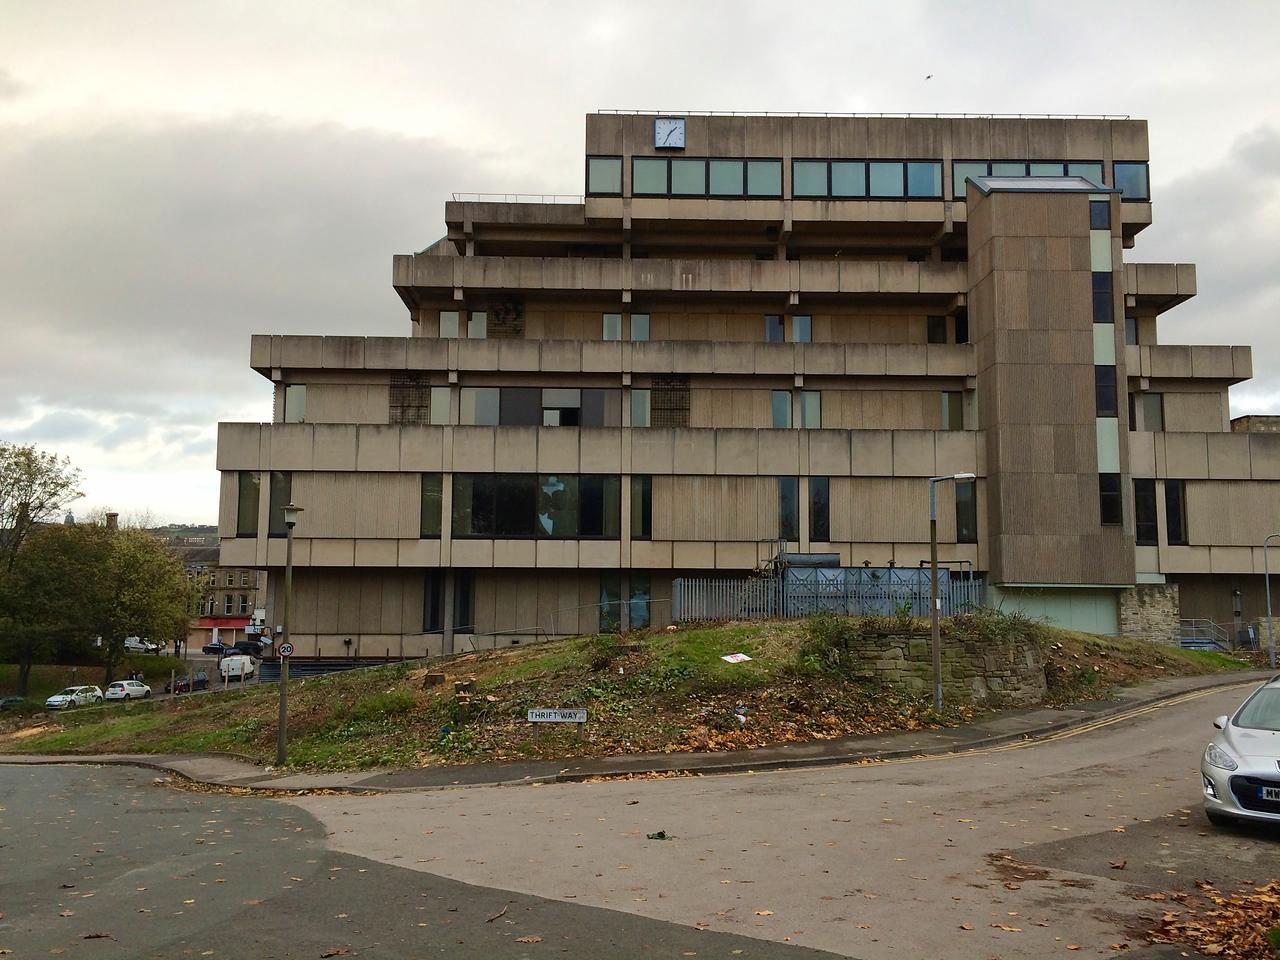 Bradford and Bingley HQ in Bingley